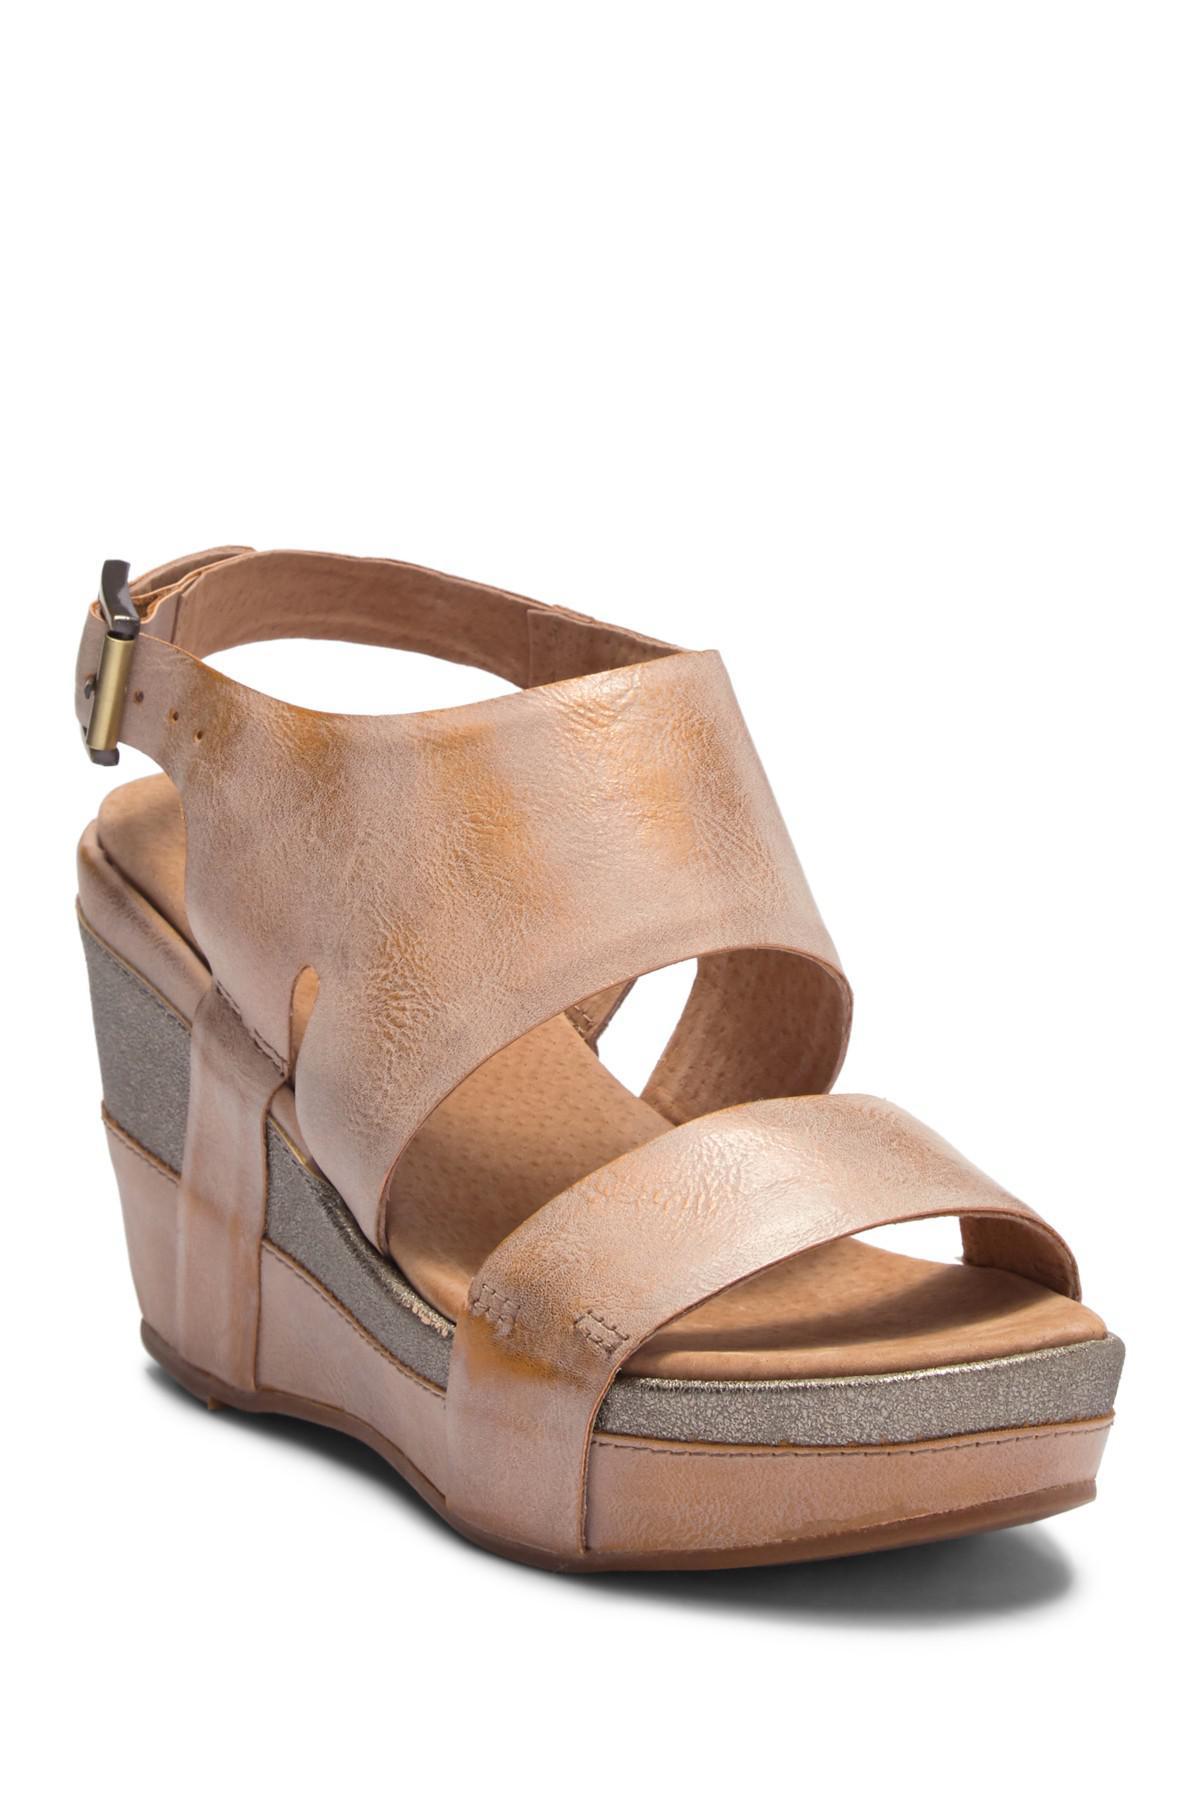 Antelope Cutout Slingback Wedge Sandal n3tr2X